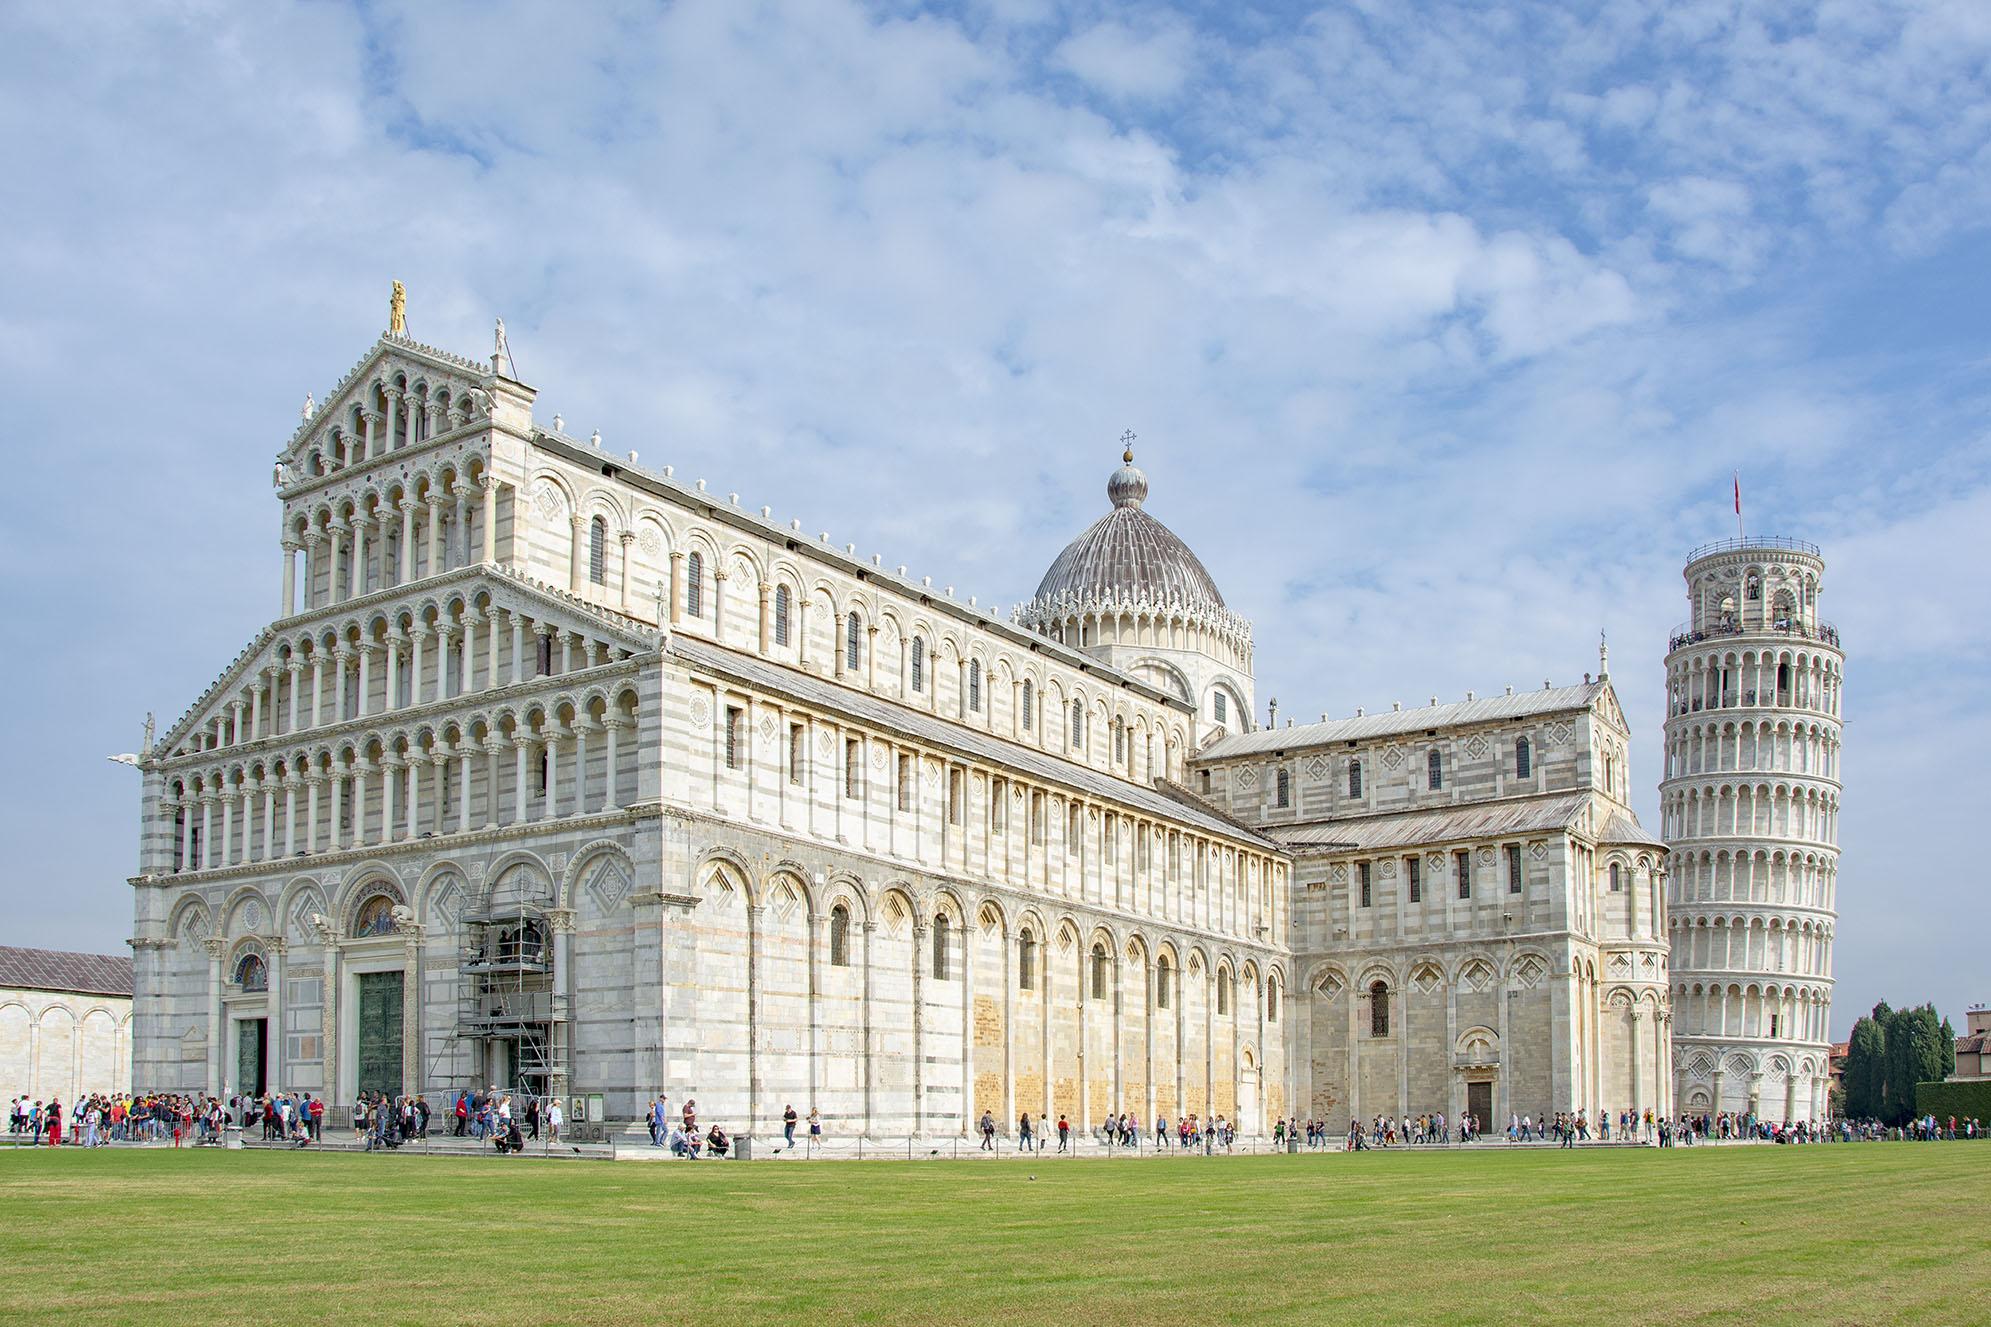 Duomo di Pisa med lutande tornet i bakgrunden.